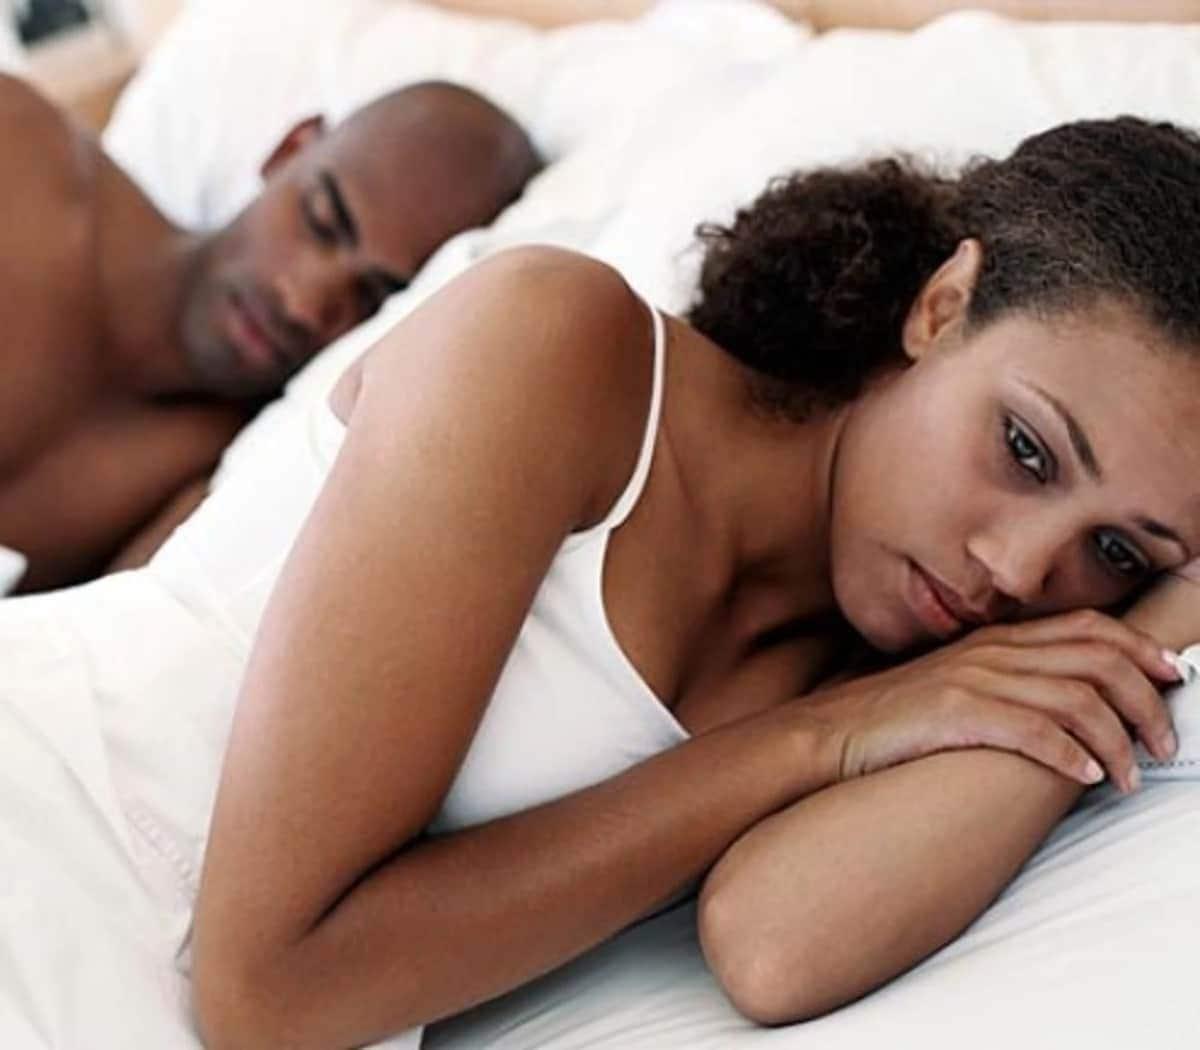 Causes of divorce in Kenya Main causes of divorce Causes of divorce today